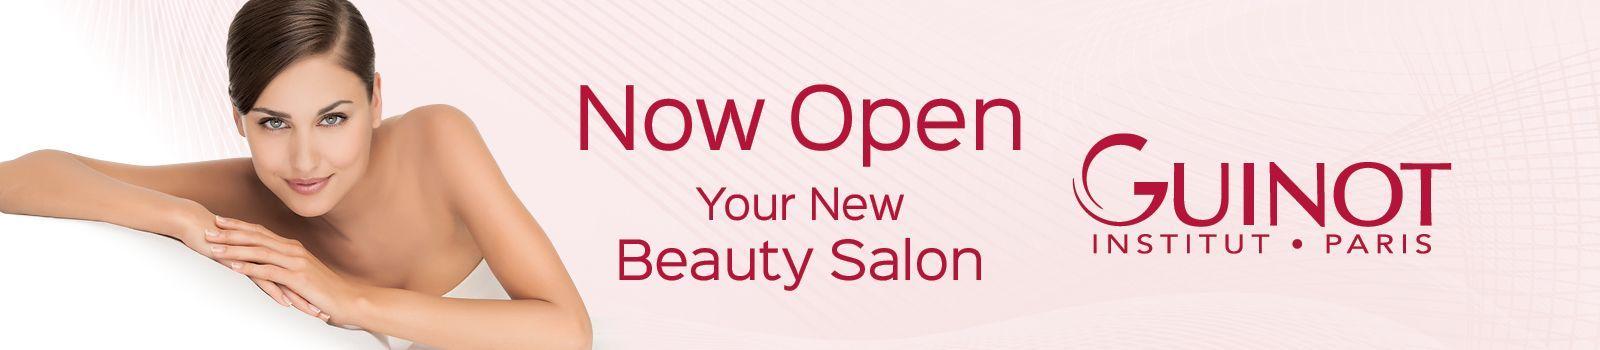 1569252085.8303bandeau-homepage-new-beauty-salon-guinot.jpg